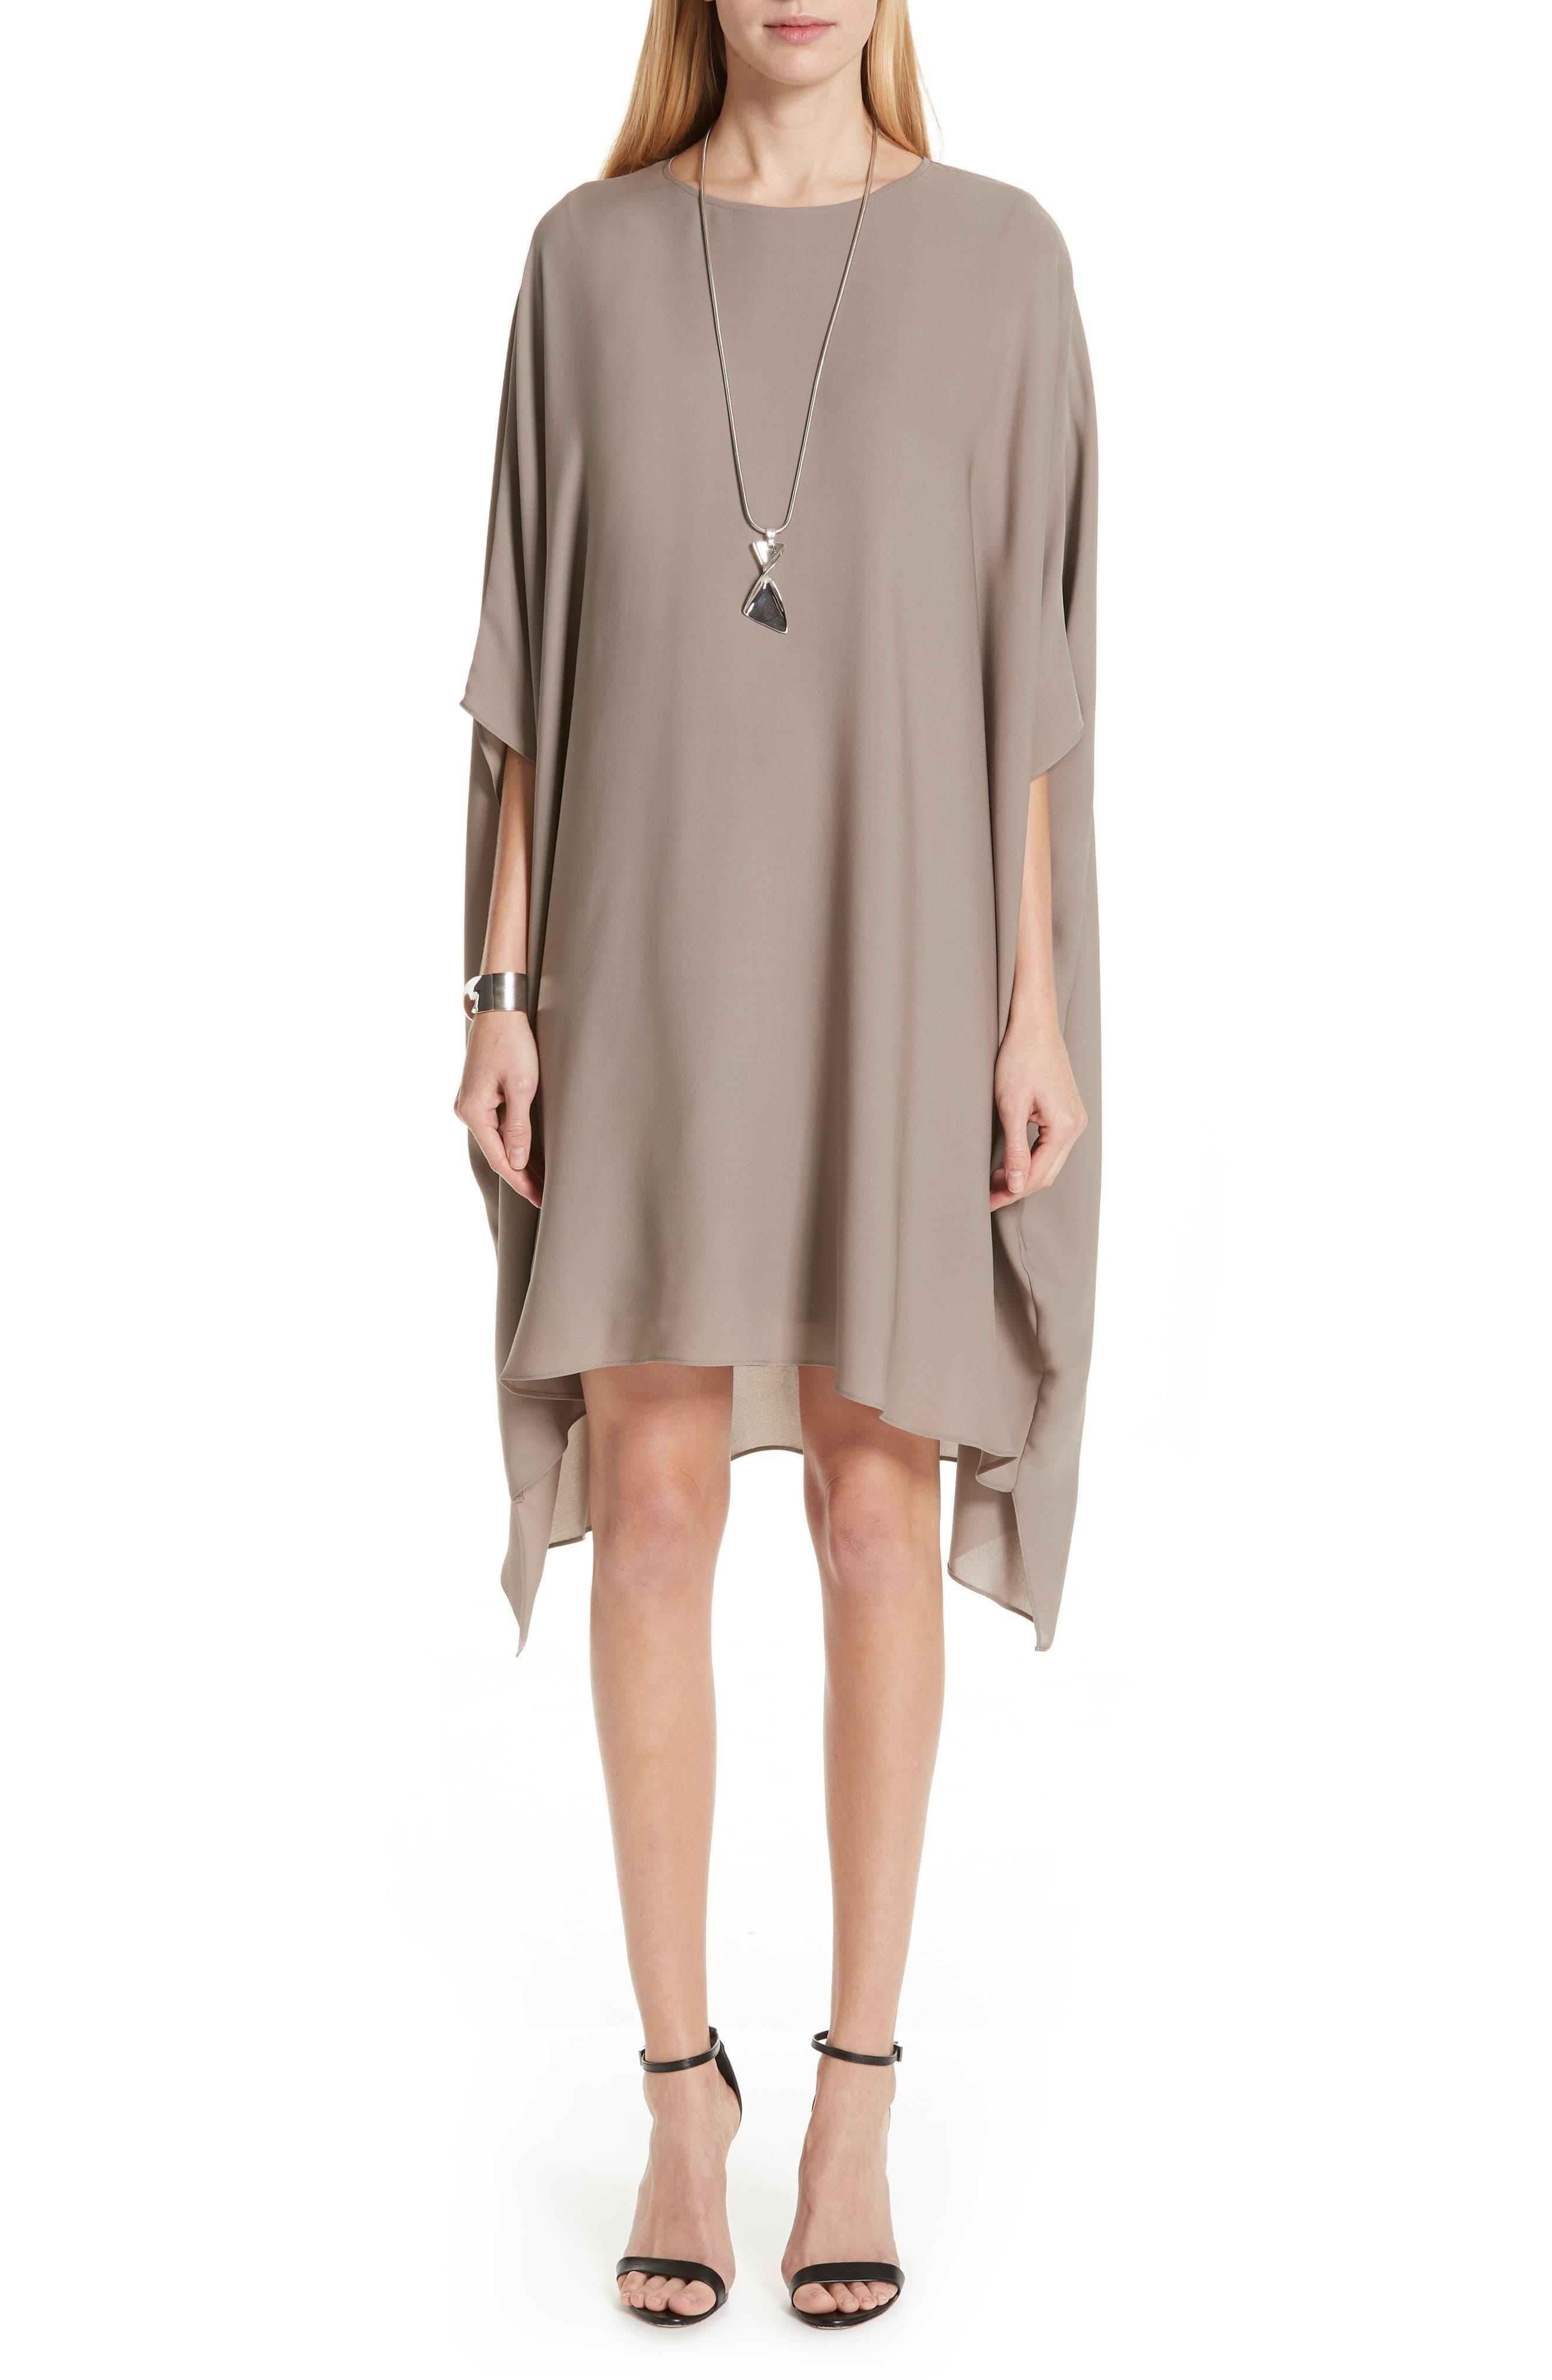 St. John Collection Draped Satin Silk Georgette Dress, Size Petite - Grey